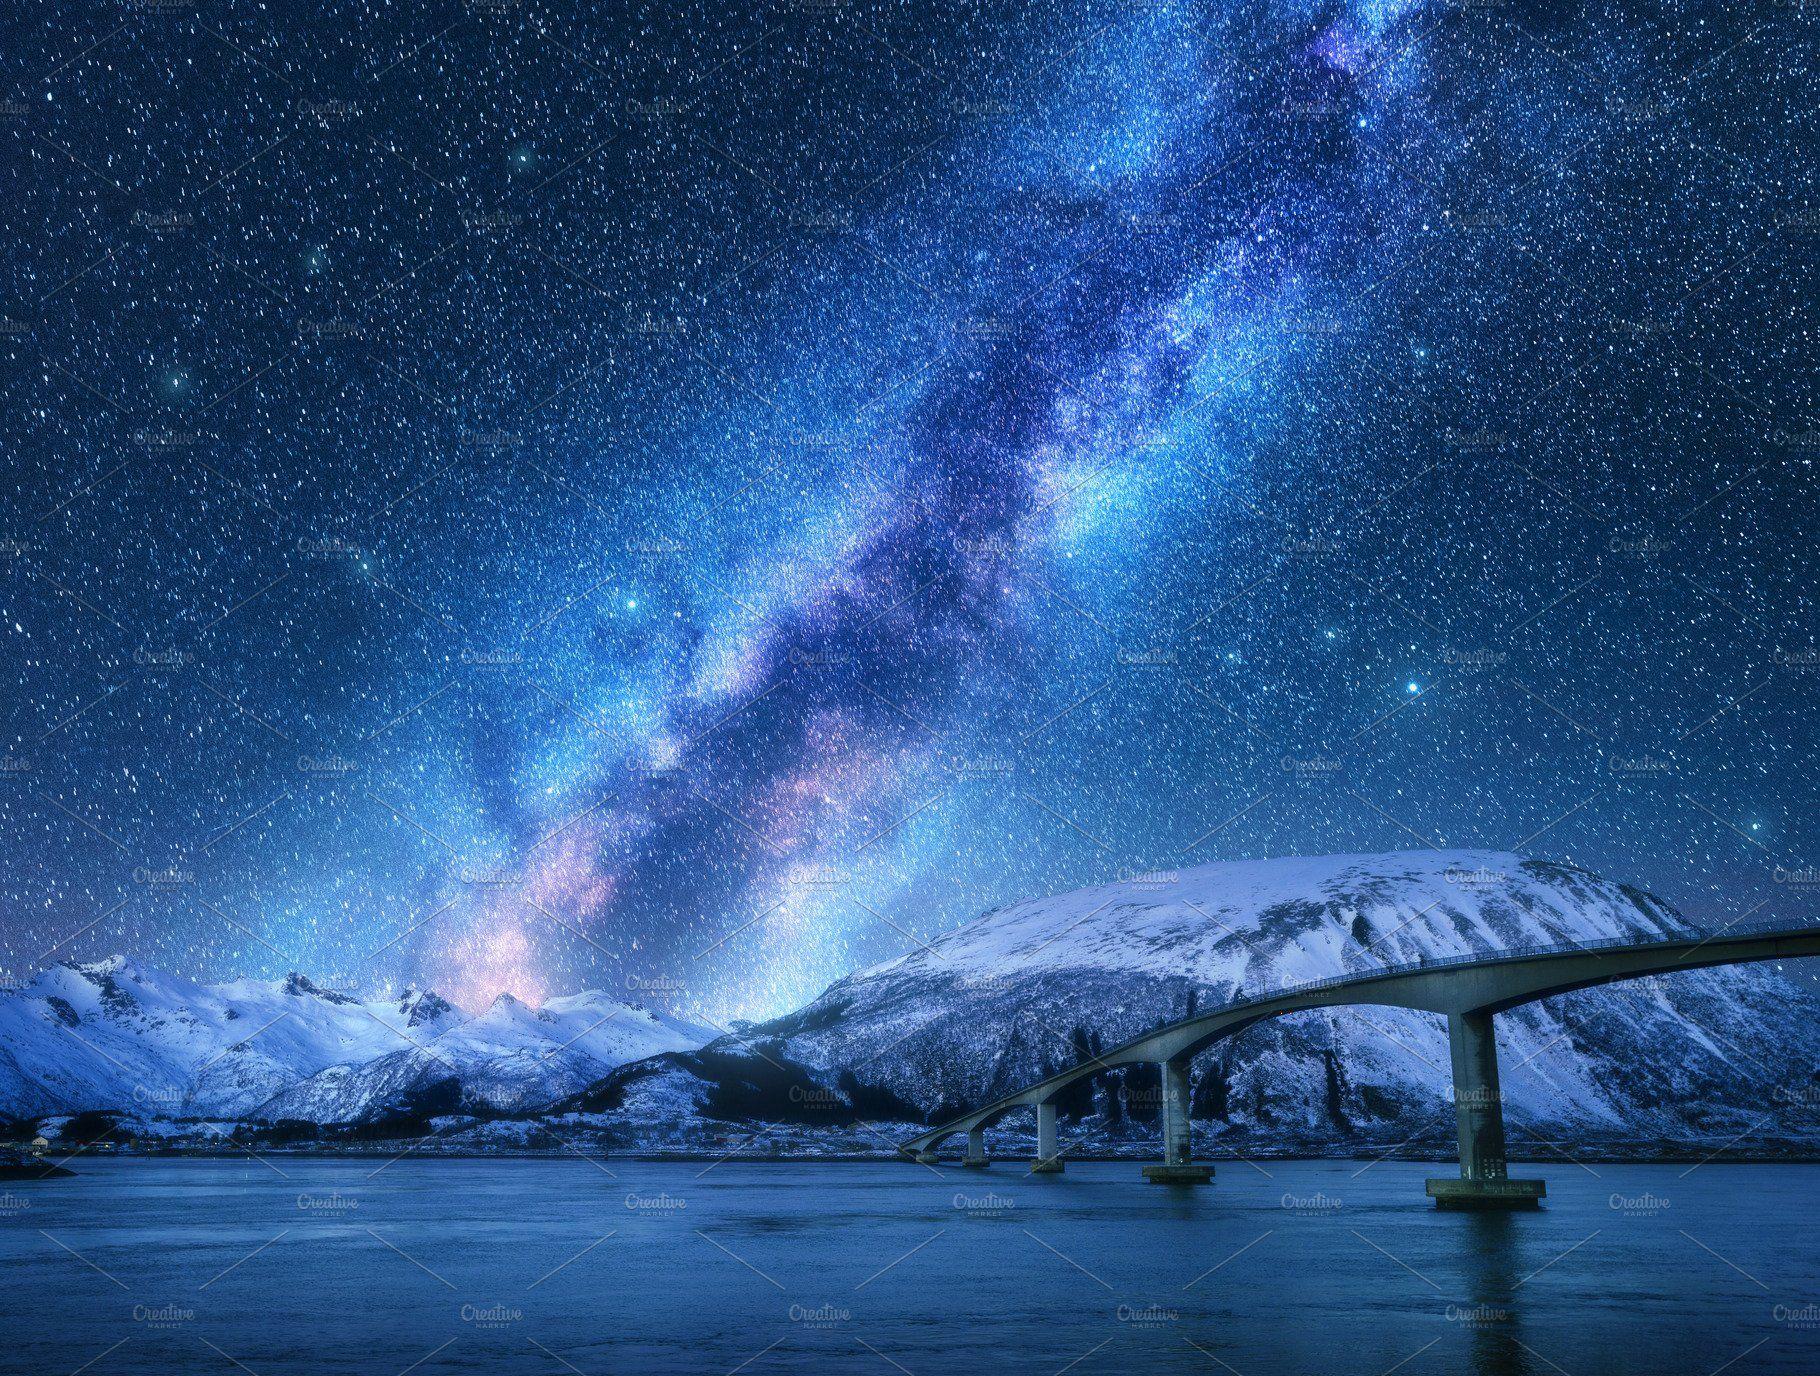 Bridge And Starry Sky With Milky Way Night Landscape Milky Way Starry Sky